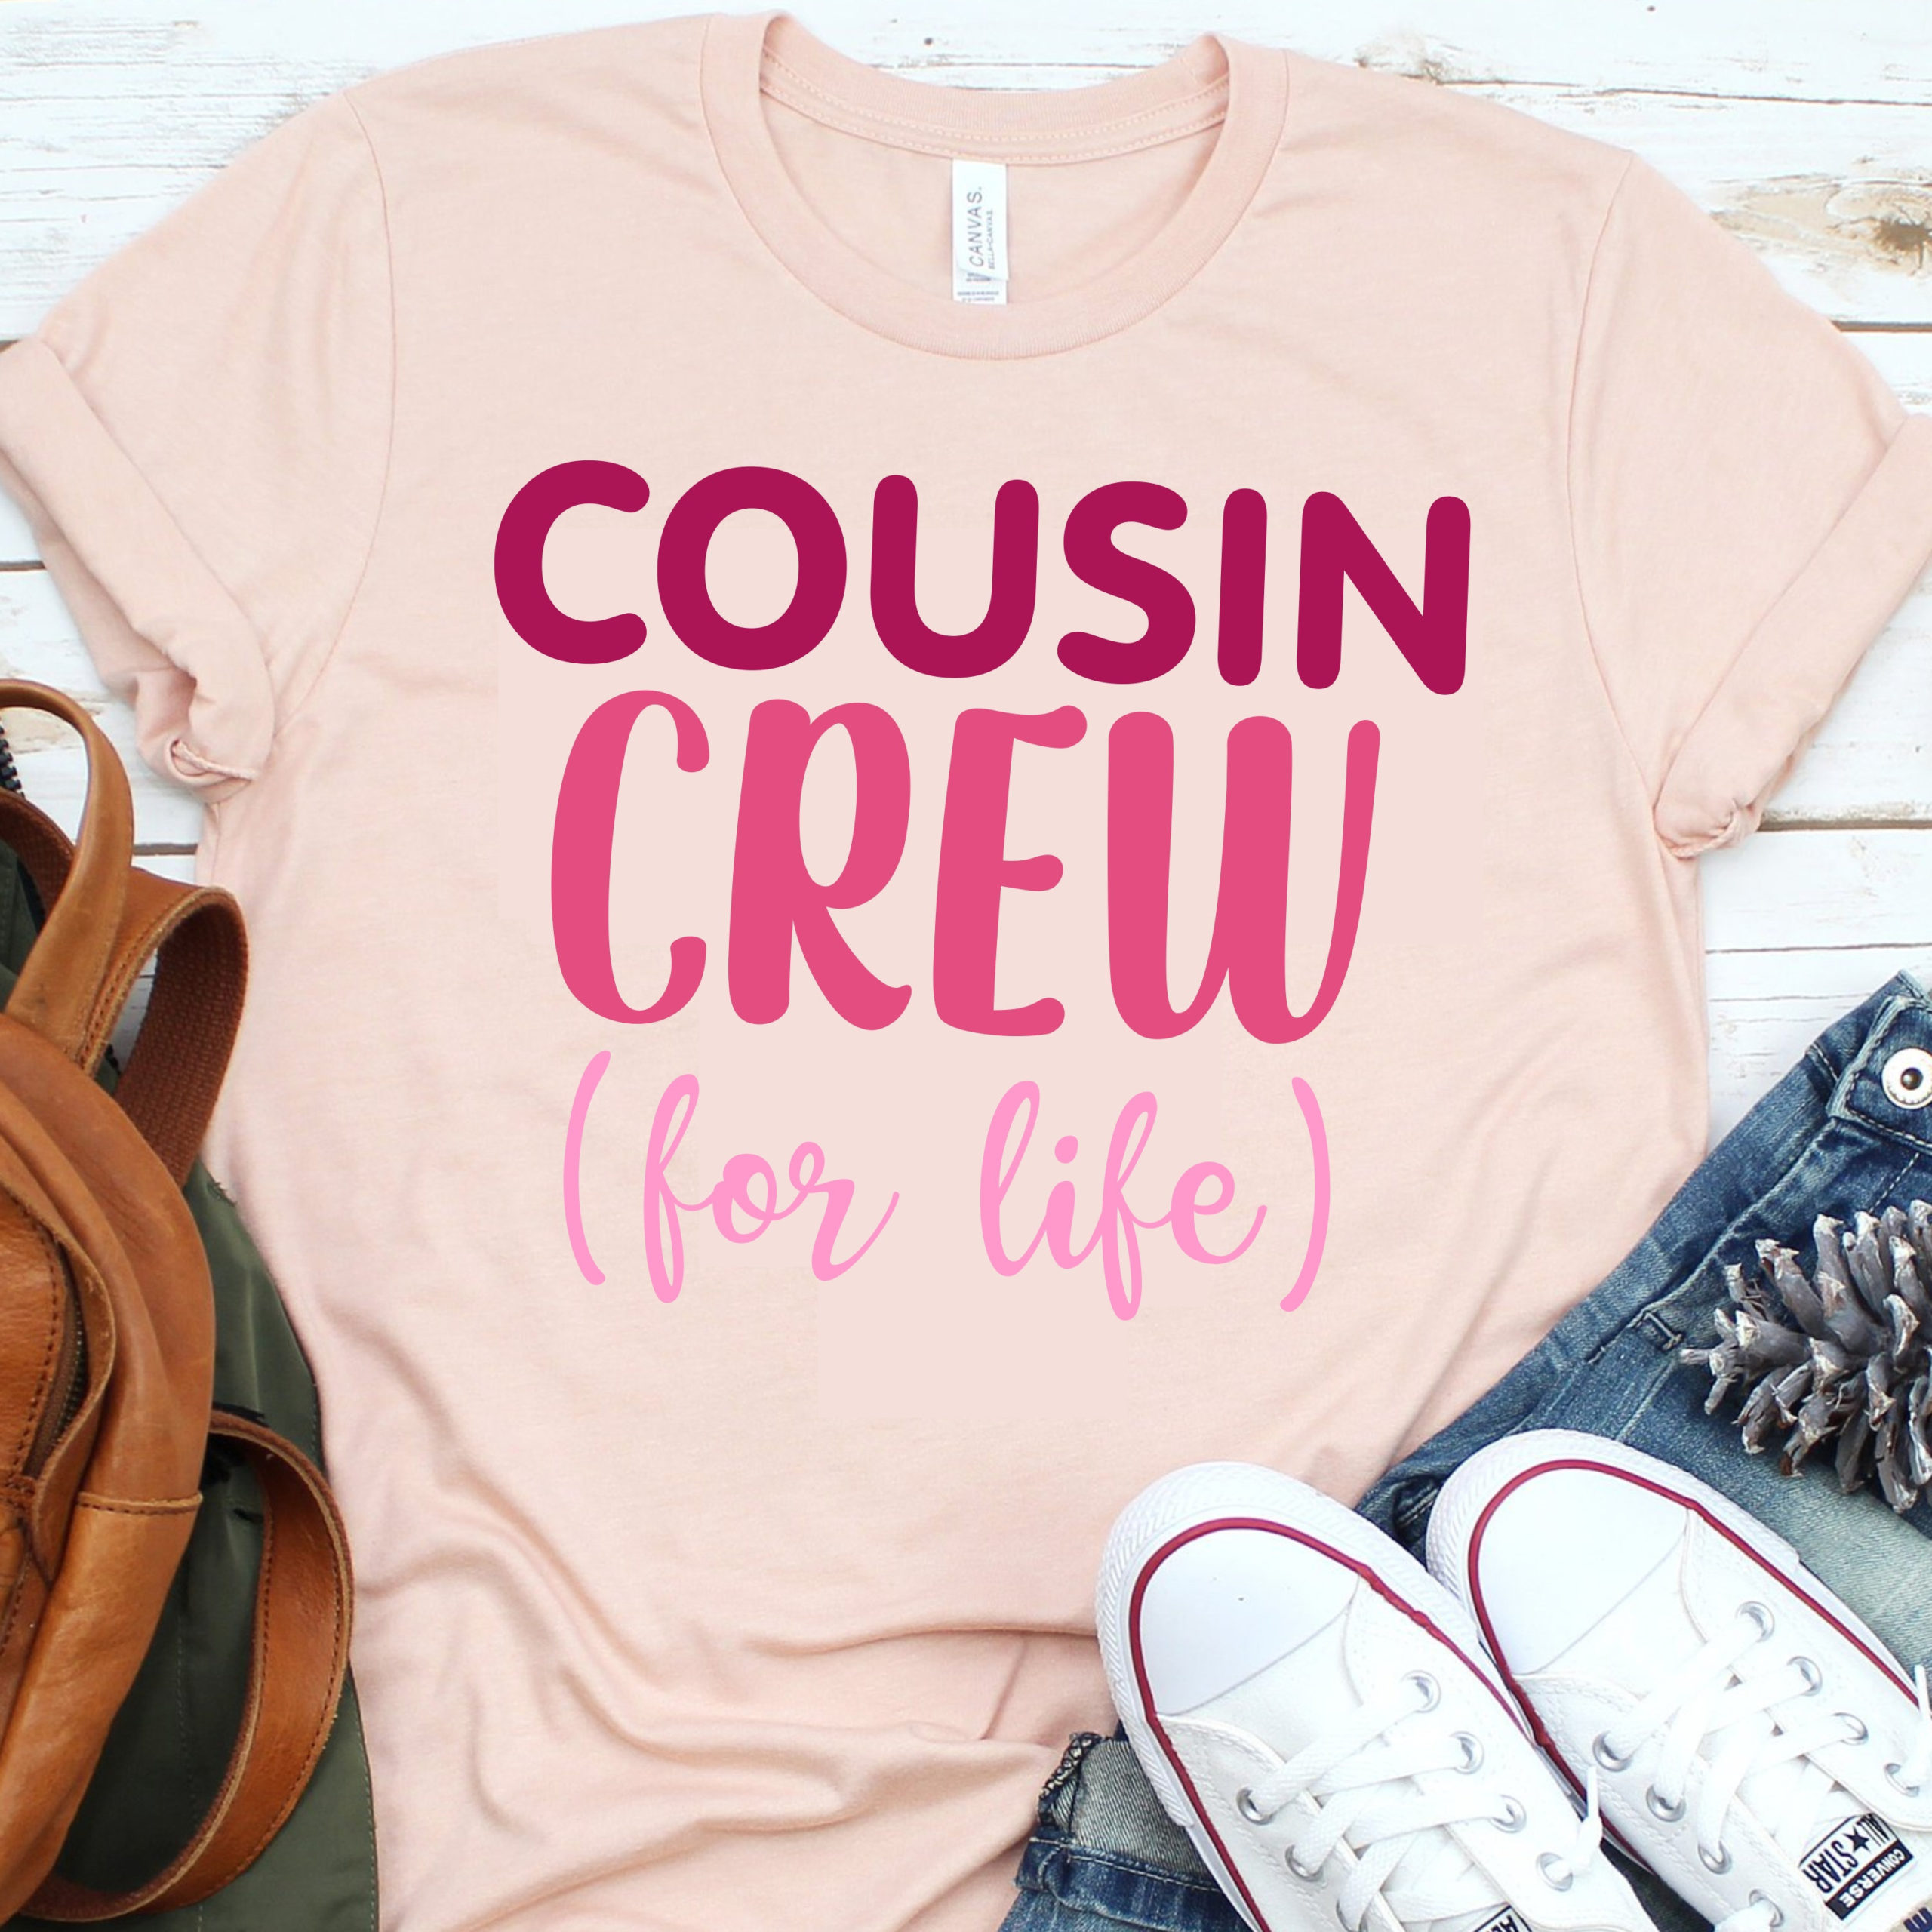 Cousin-crew-for-life-svgcousin-crew-svg-cousin-crew-svgfamily-svg-designscuttable-svg-designs-cuttable-cut-file-cricut-svg-60512fd4